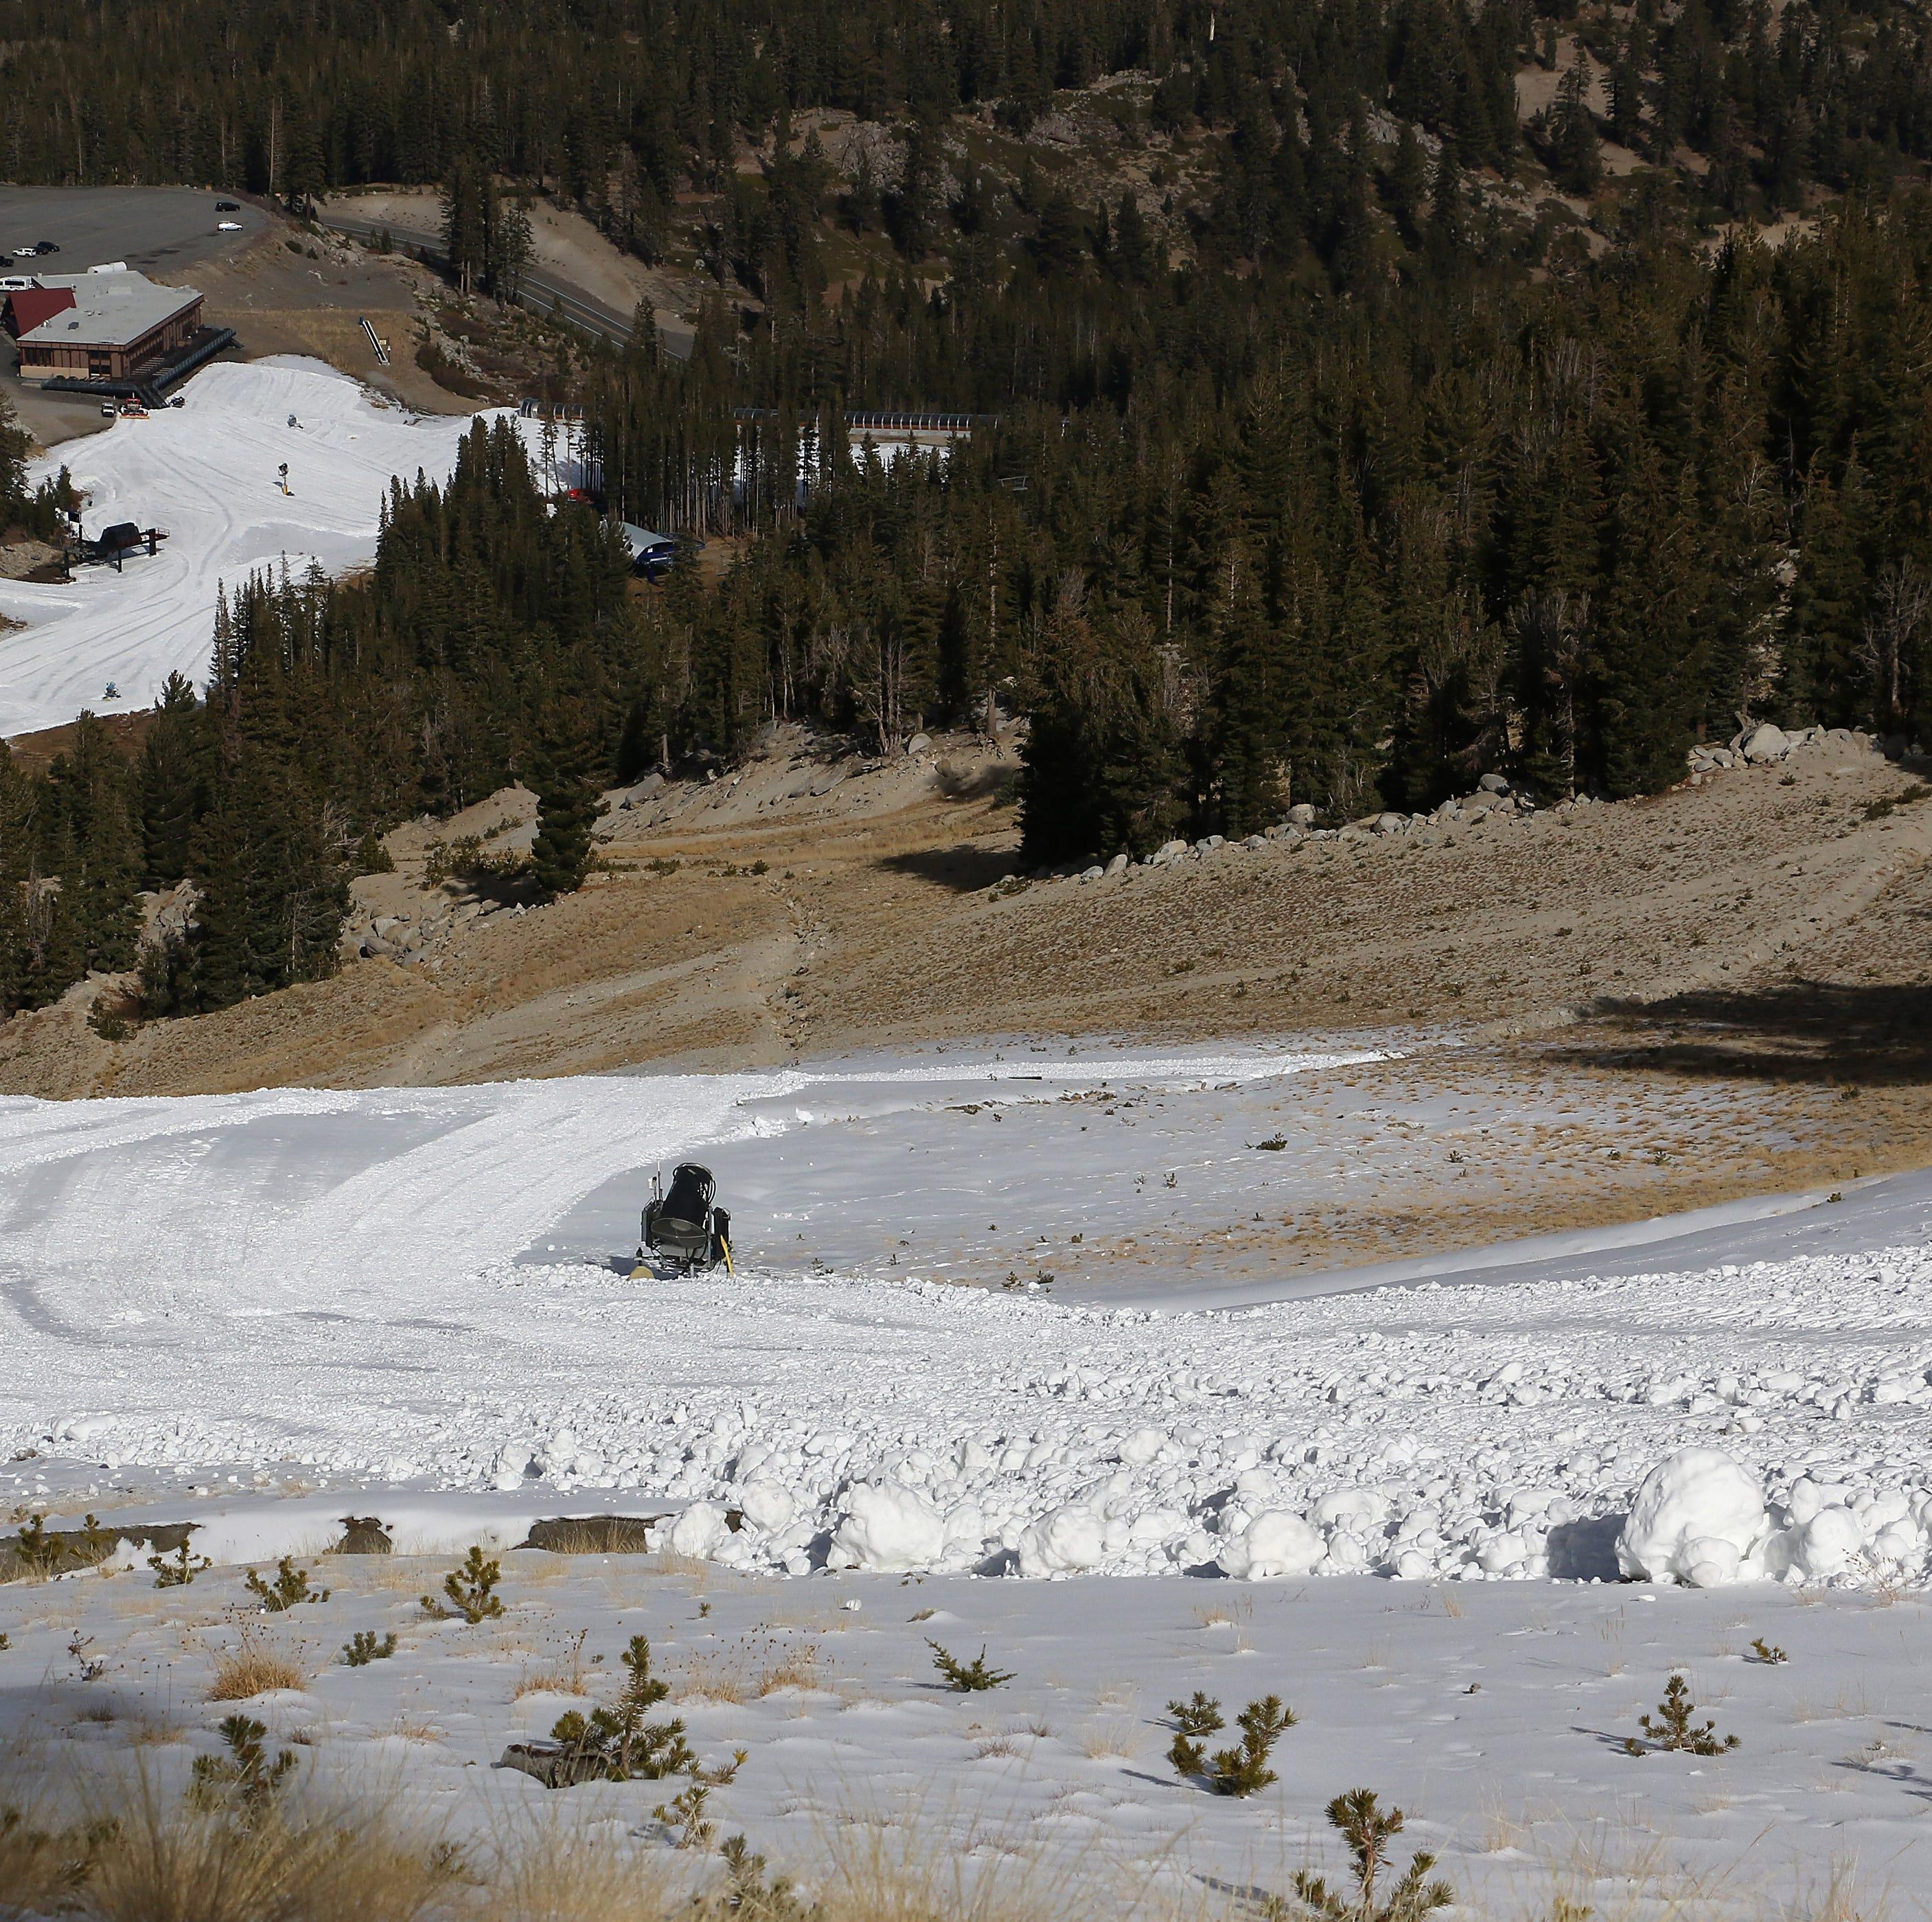 Snowmaking upgrades help Tahoe resorts welcome skiers despite warm, dry conditions